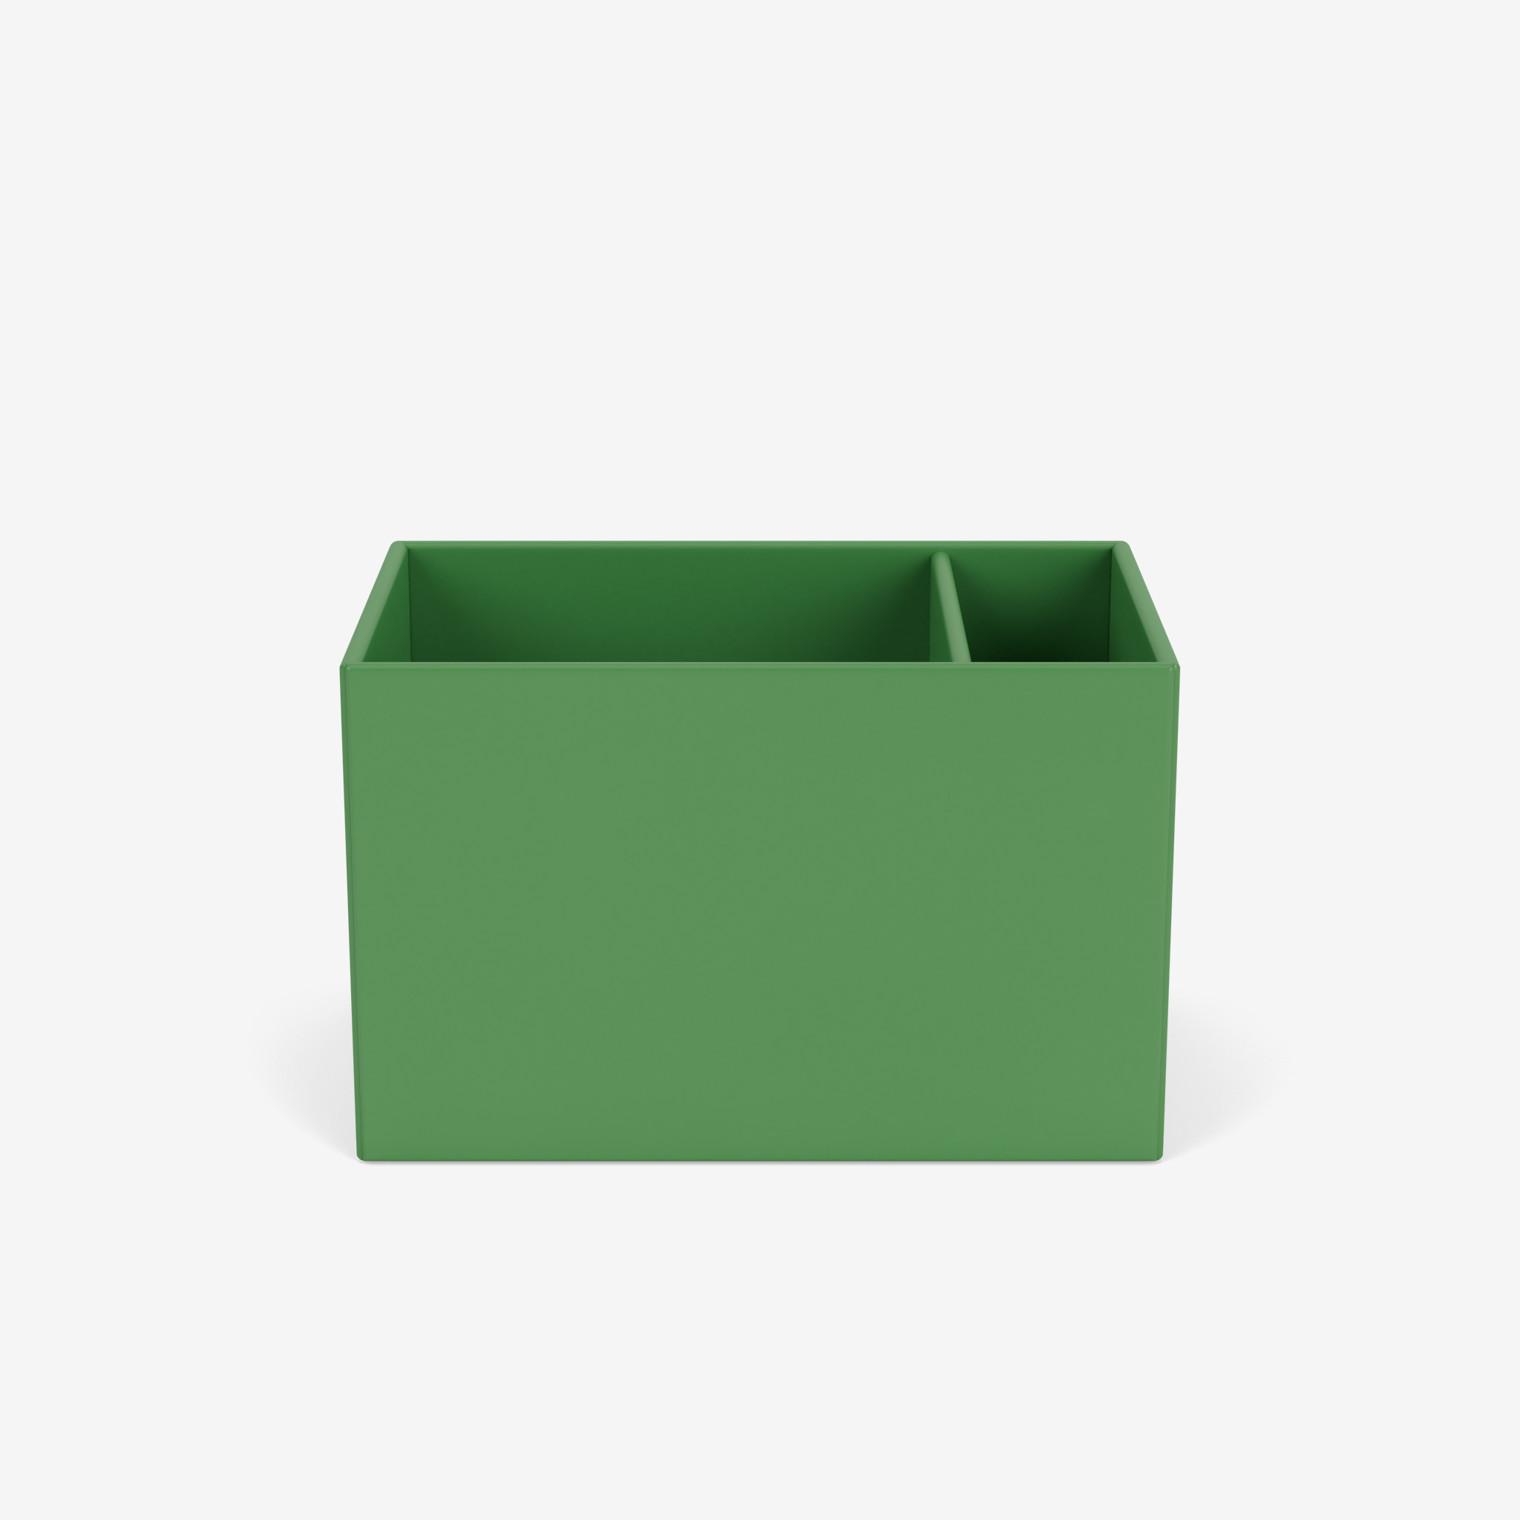 Living Things LT3042 Pflanzenbox